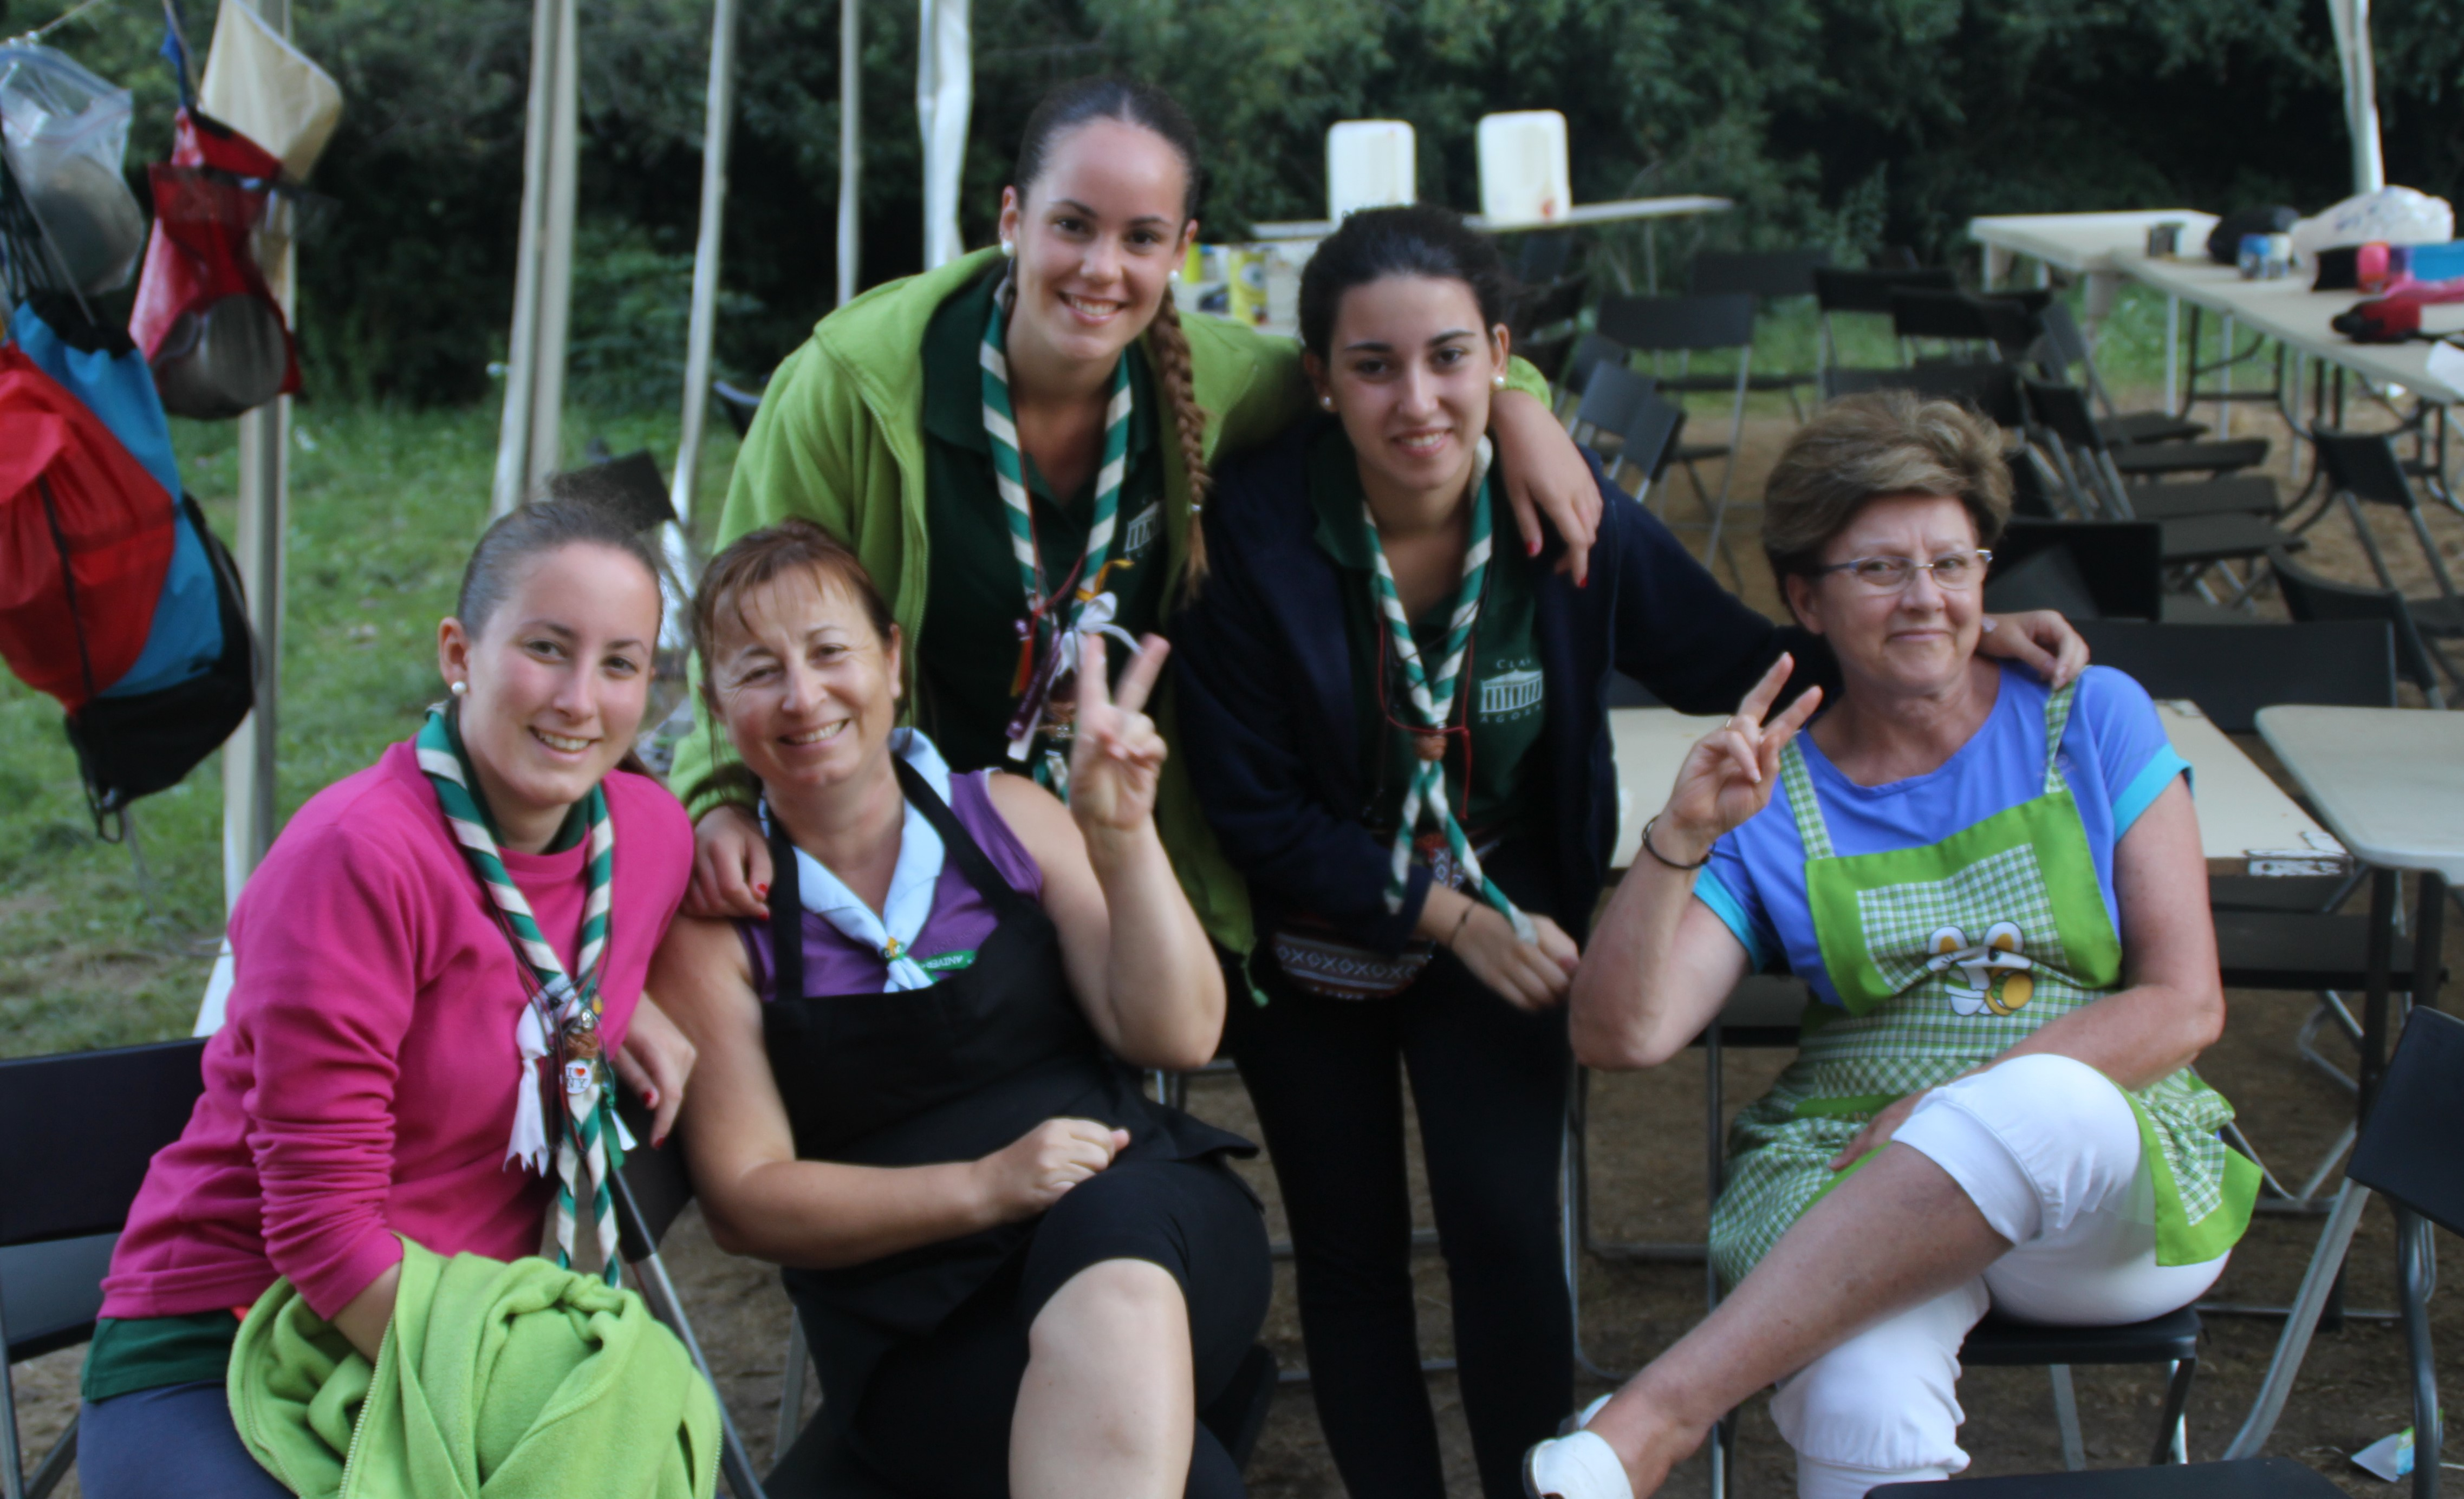 15-16 - Grupo - Campamento de verano - P90